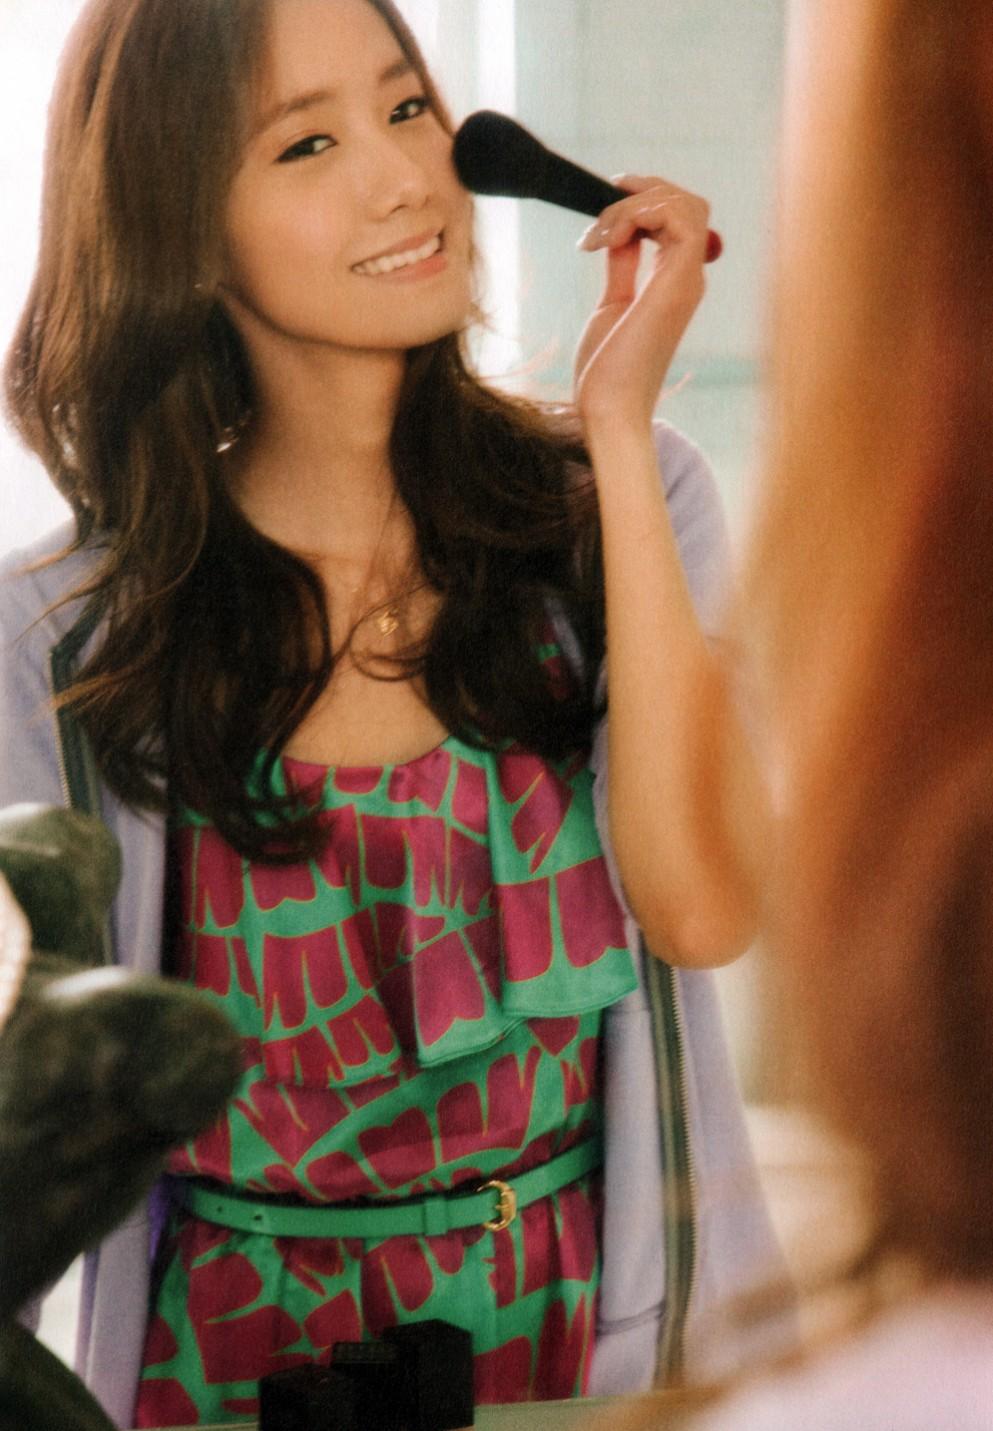 Yoona Applying Makeup Wallpaper SNSD Artistic Gallery 993x1431